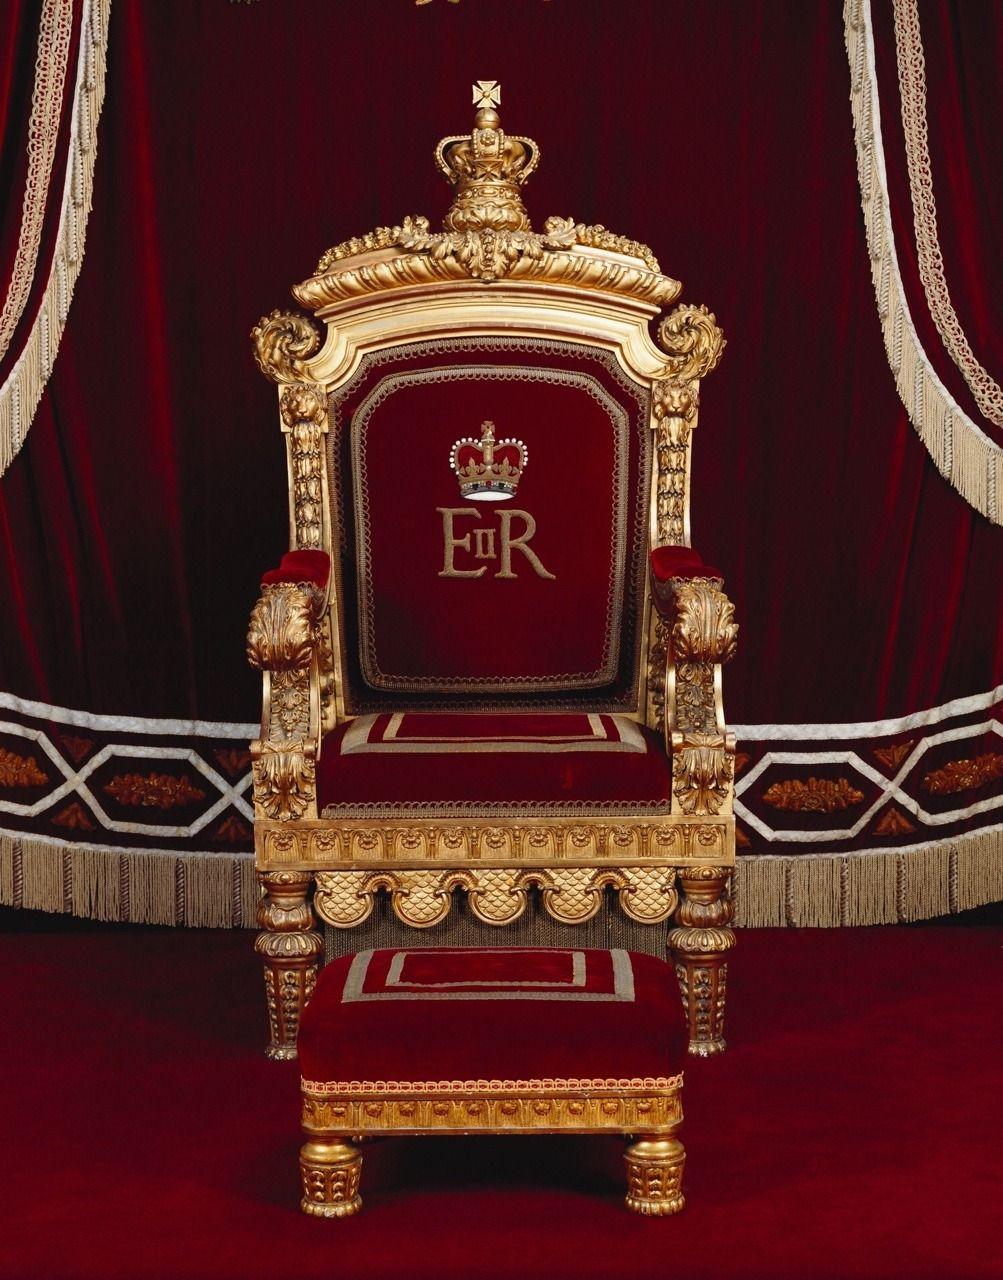 Buckingham Palace Throne Room In 2019 Throne Chair